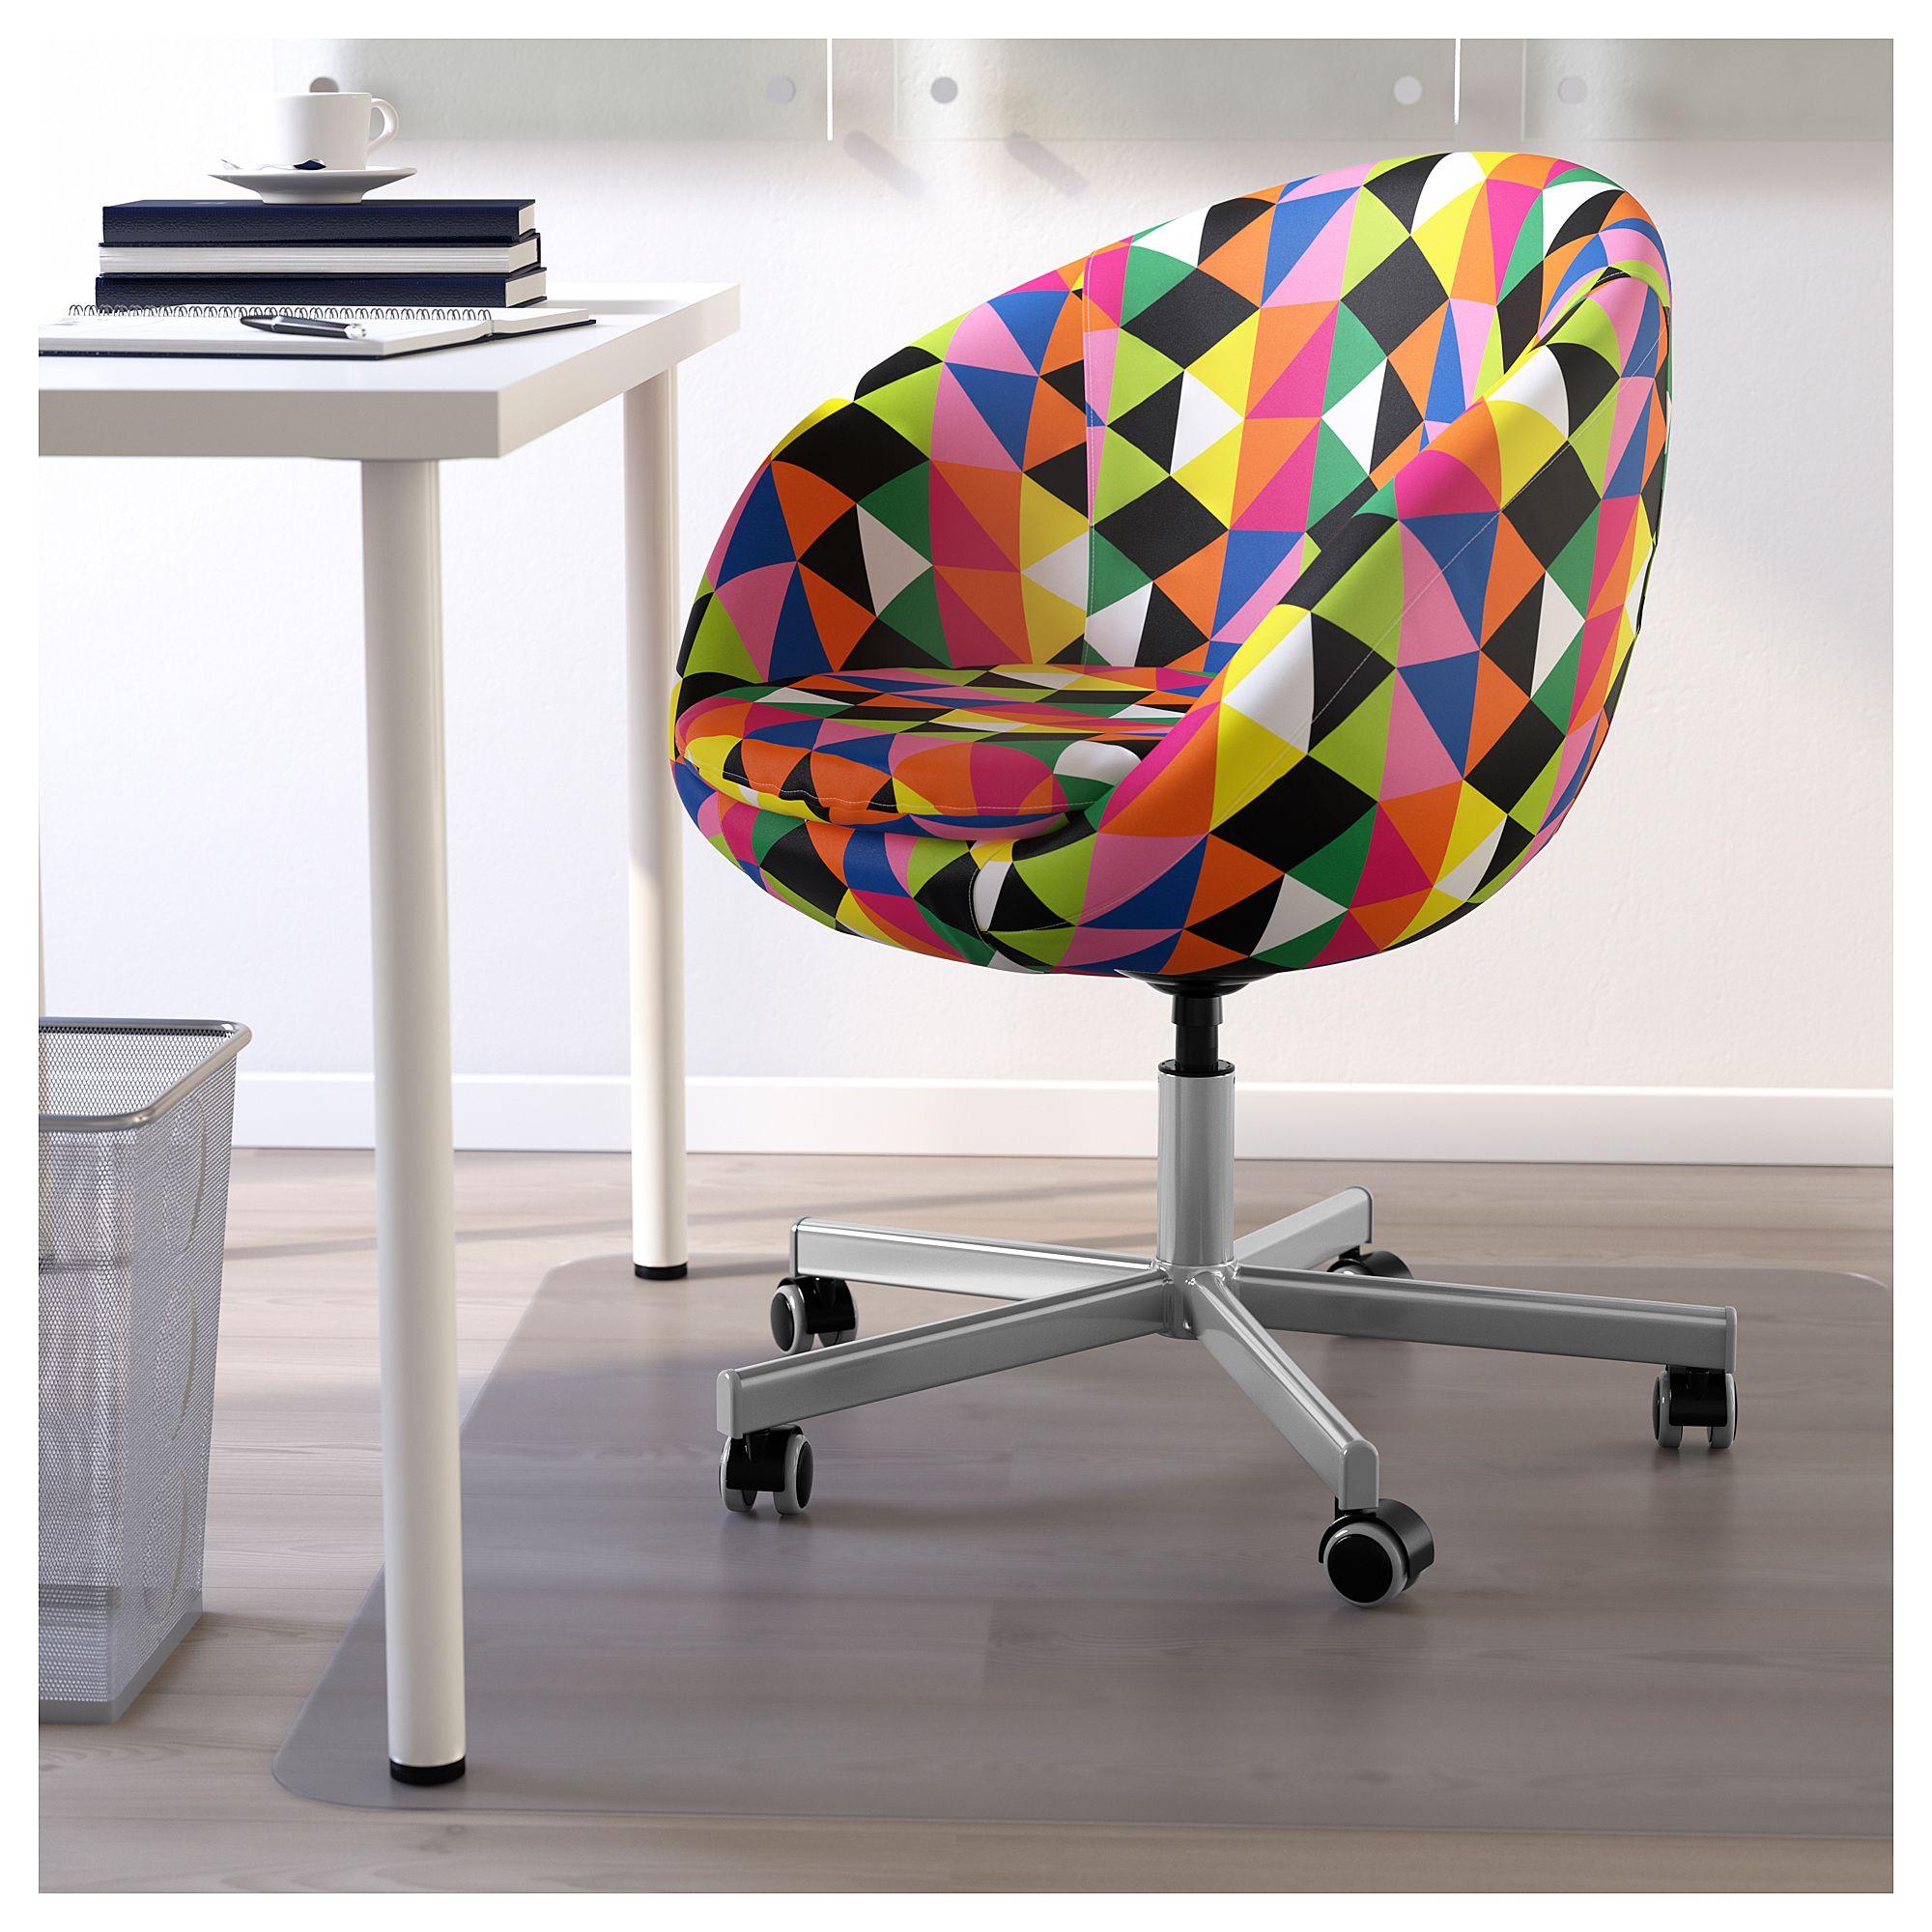 Furniture and Home Furnishings Furniture, Chair, Home